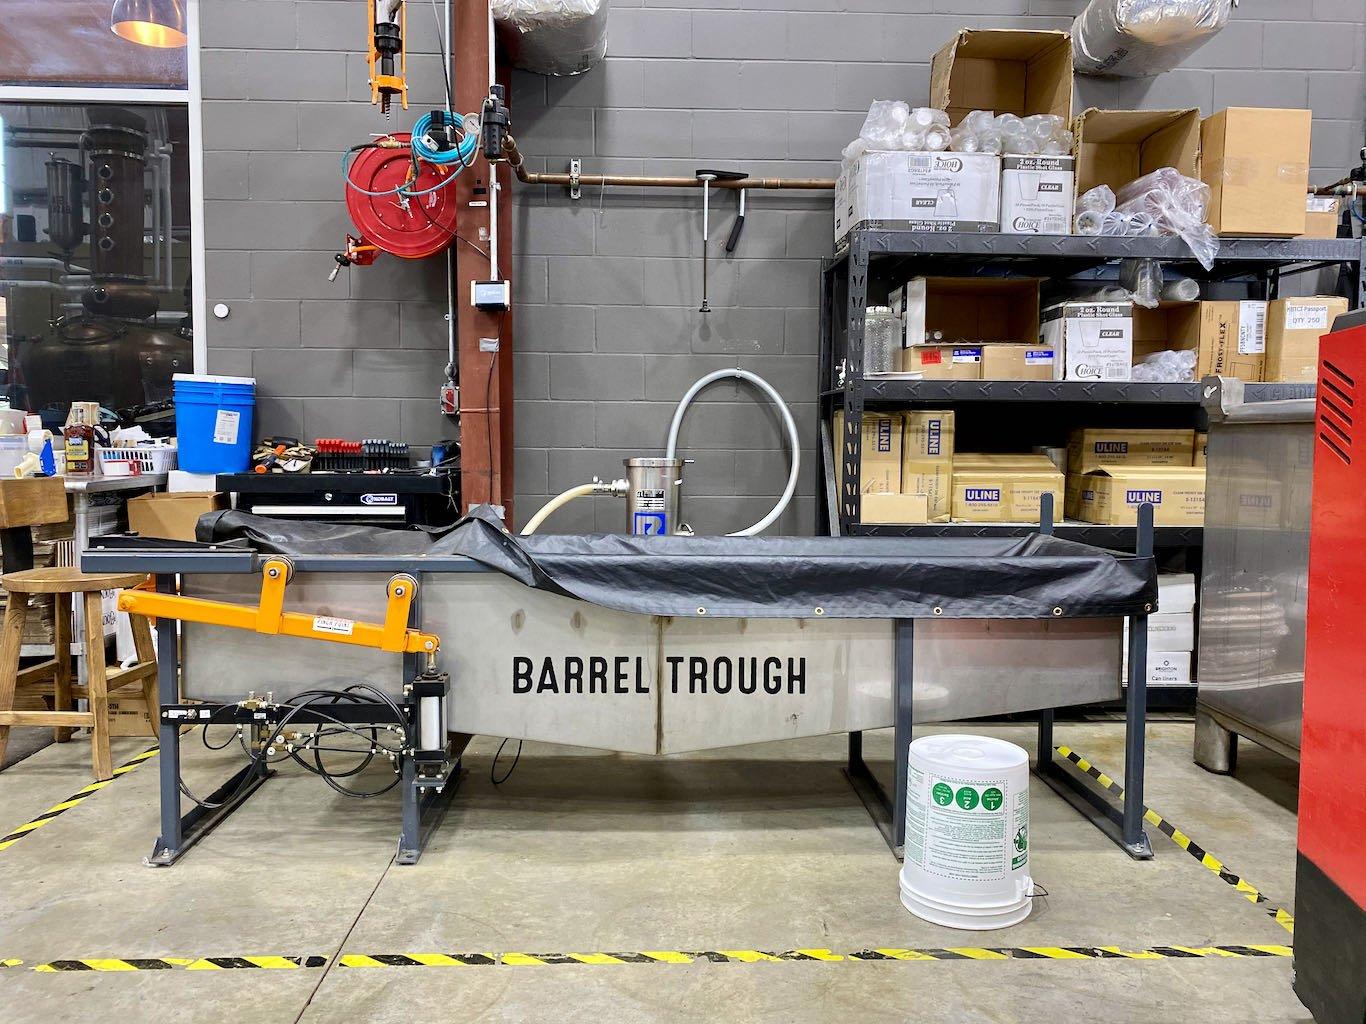 Barrel Trough -Boone County Distilling Company